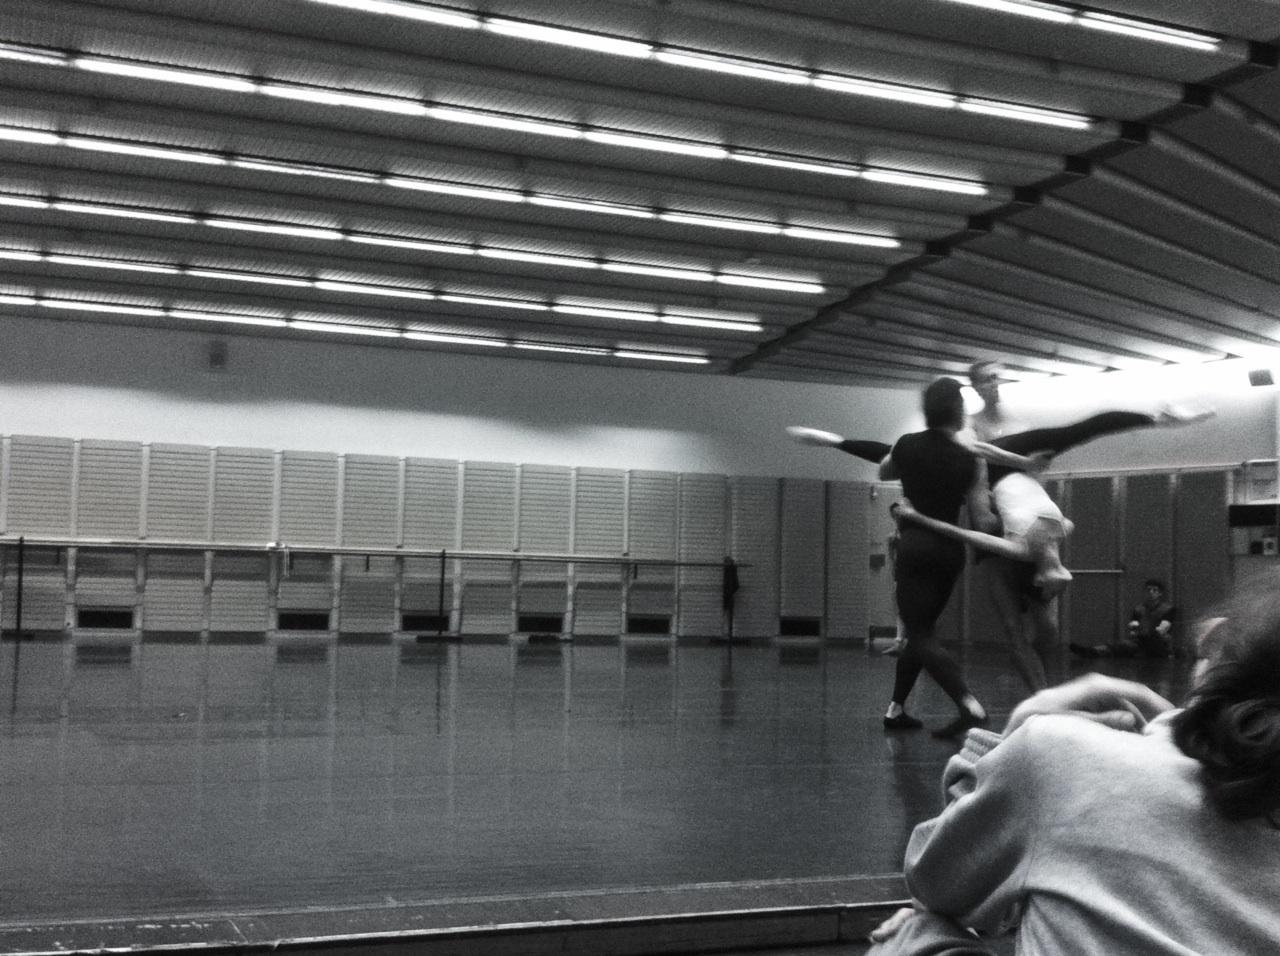 Vanguard rehearsals in full swing.